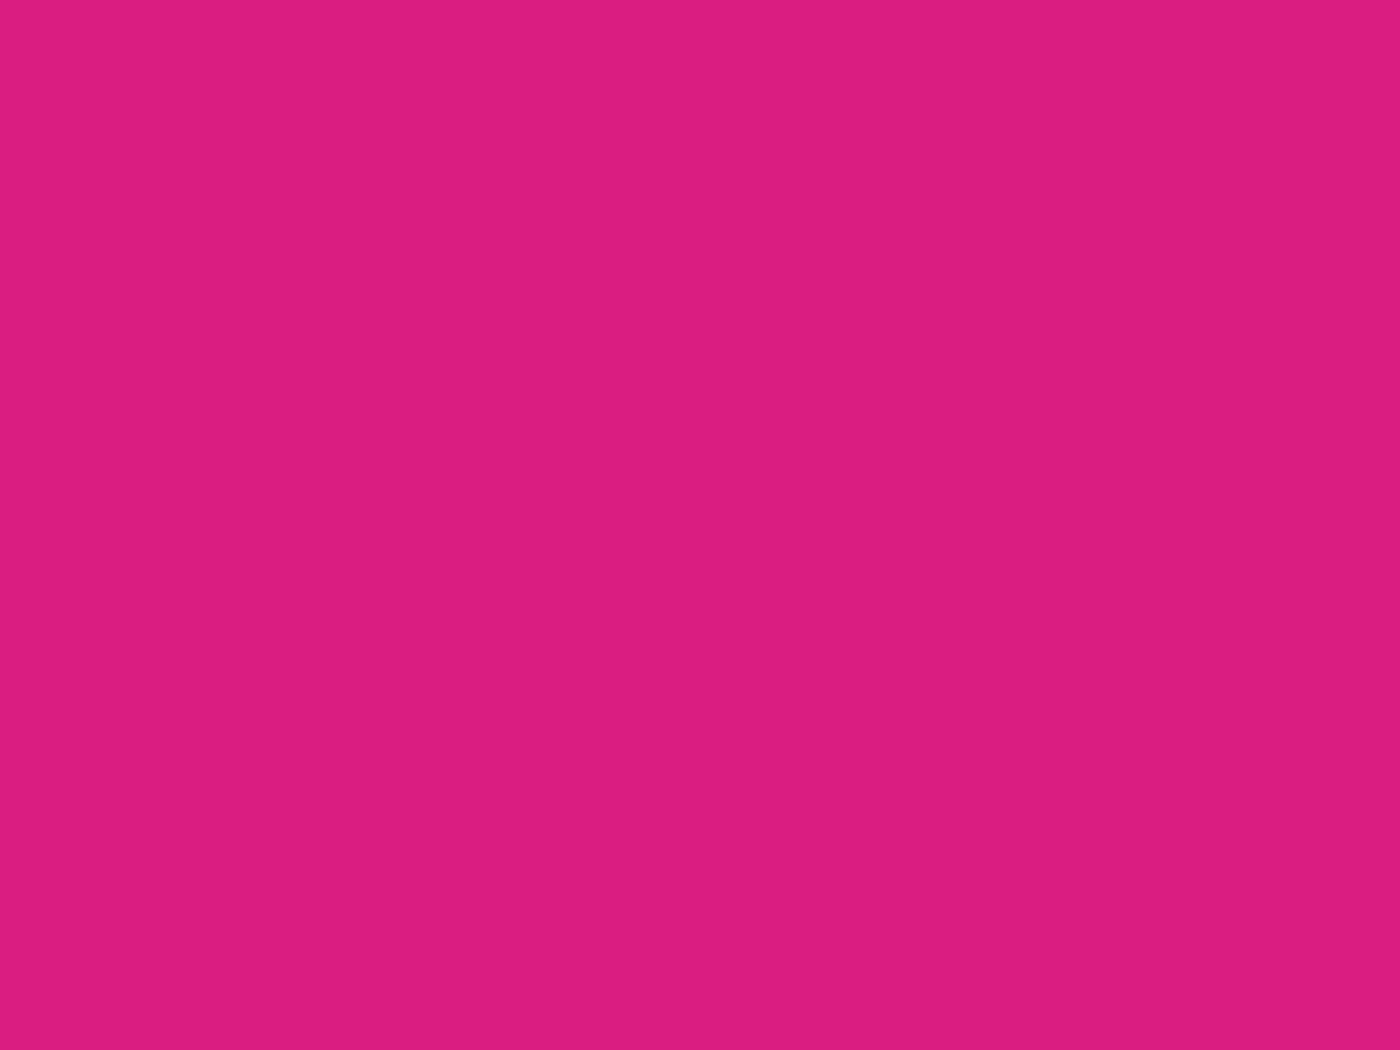 1400x1050 Vivid Cerise Solid Color Background